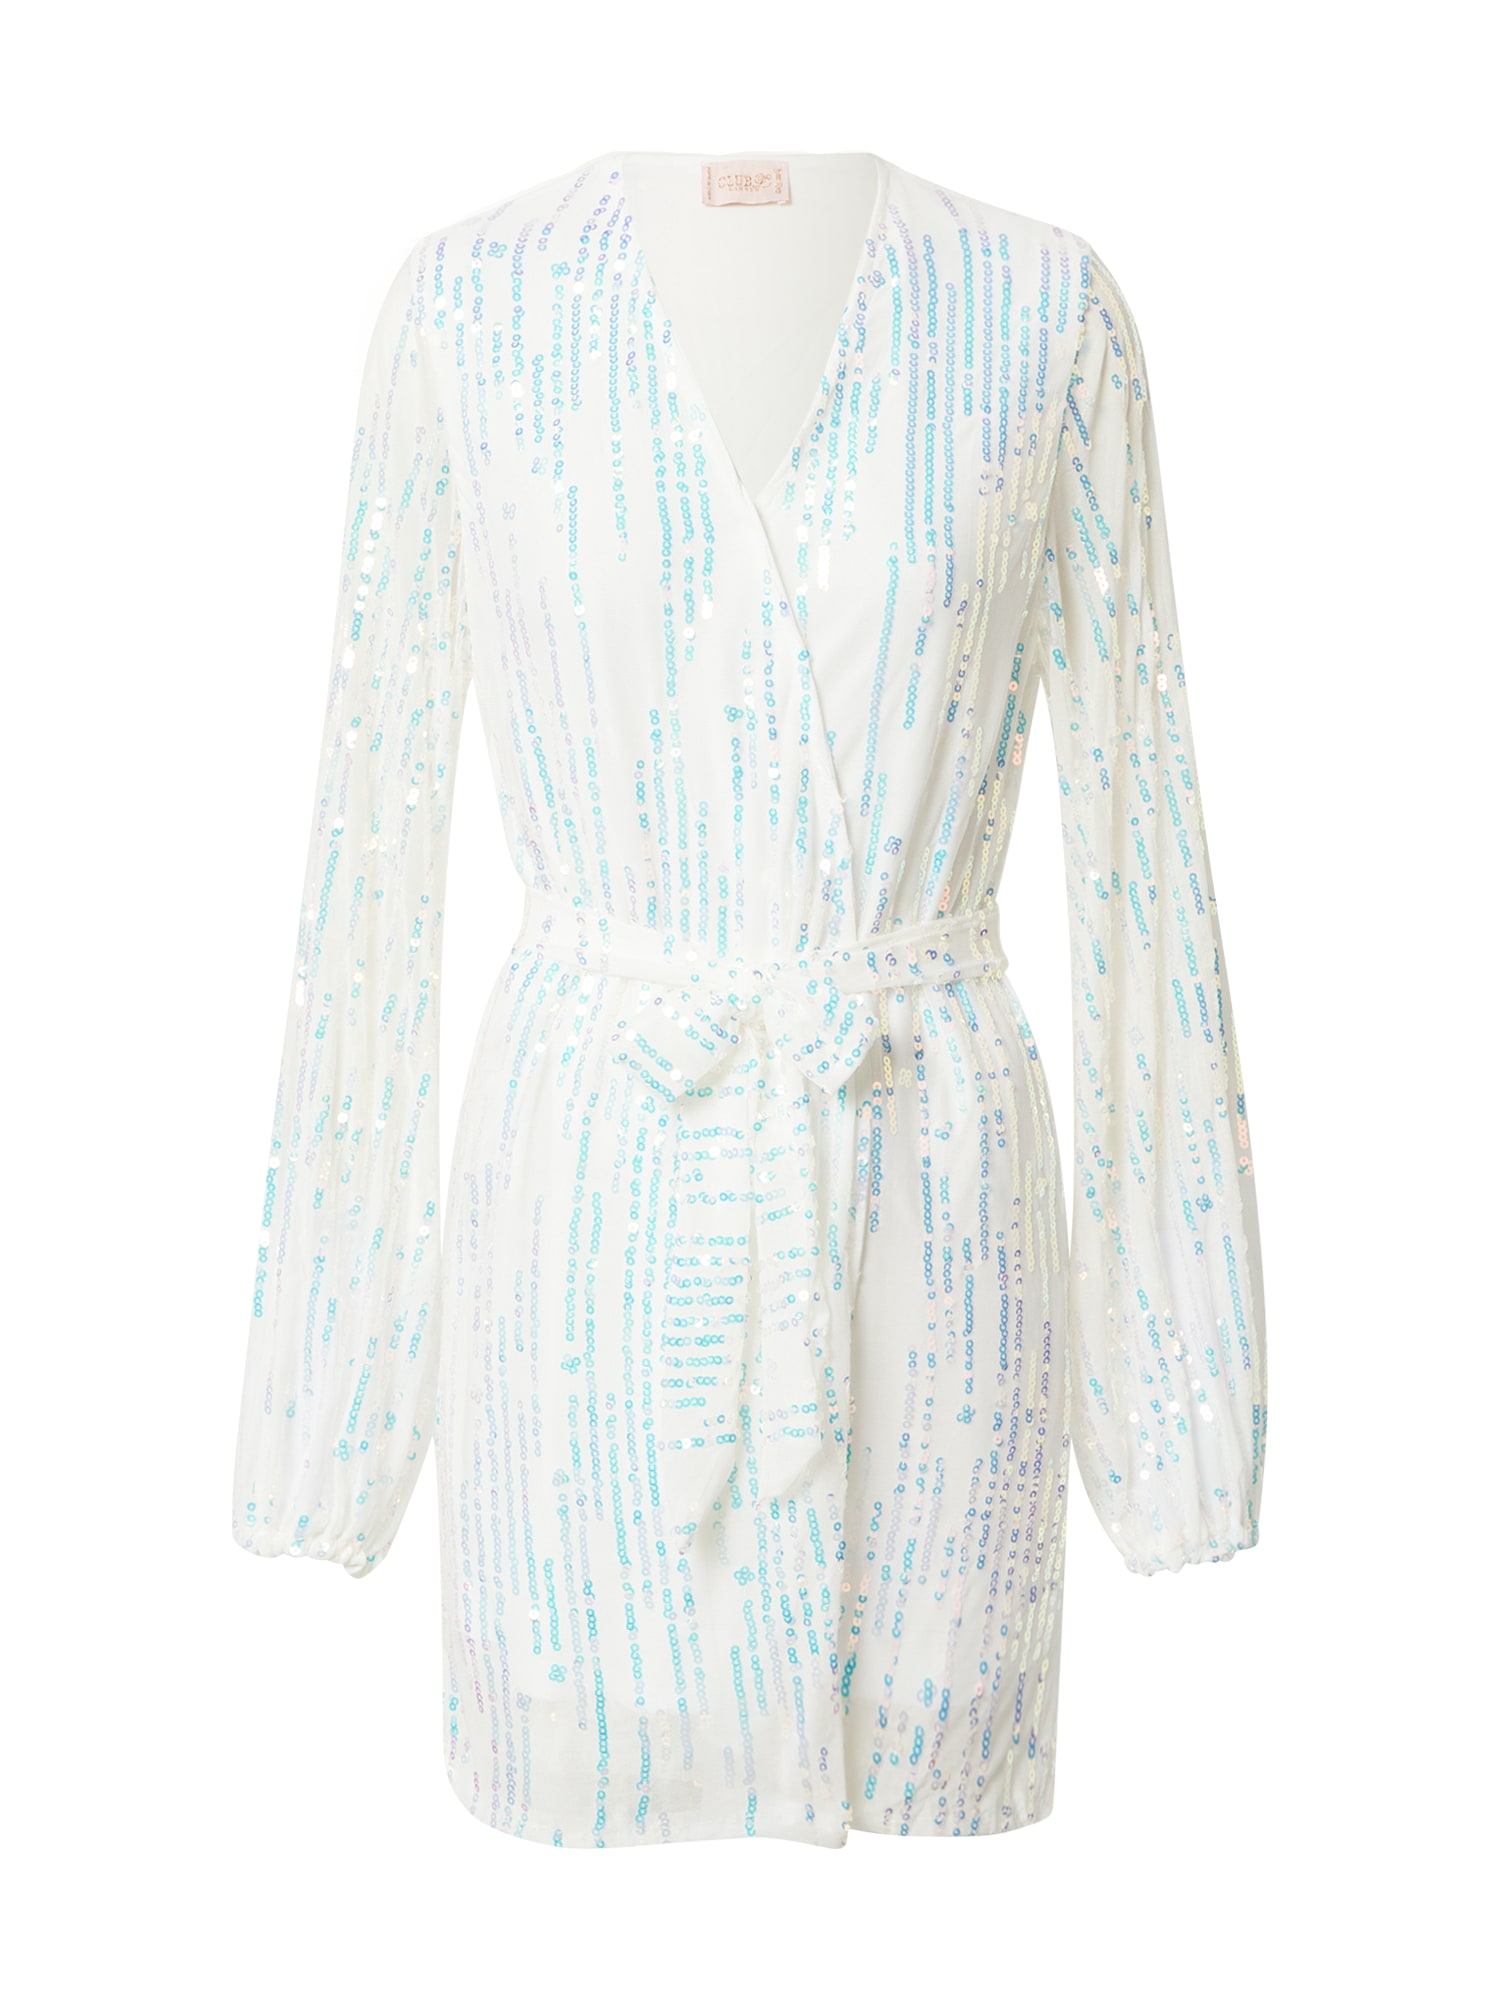 CLUB L LONDON Suknelė balta / turkio spalva